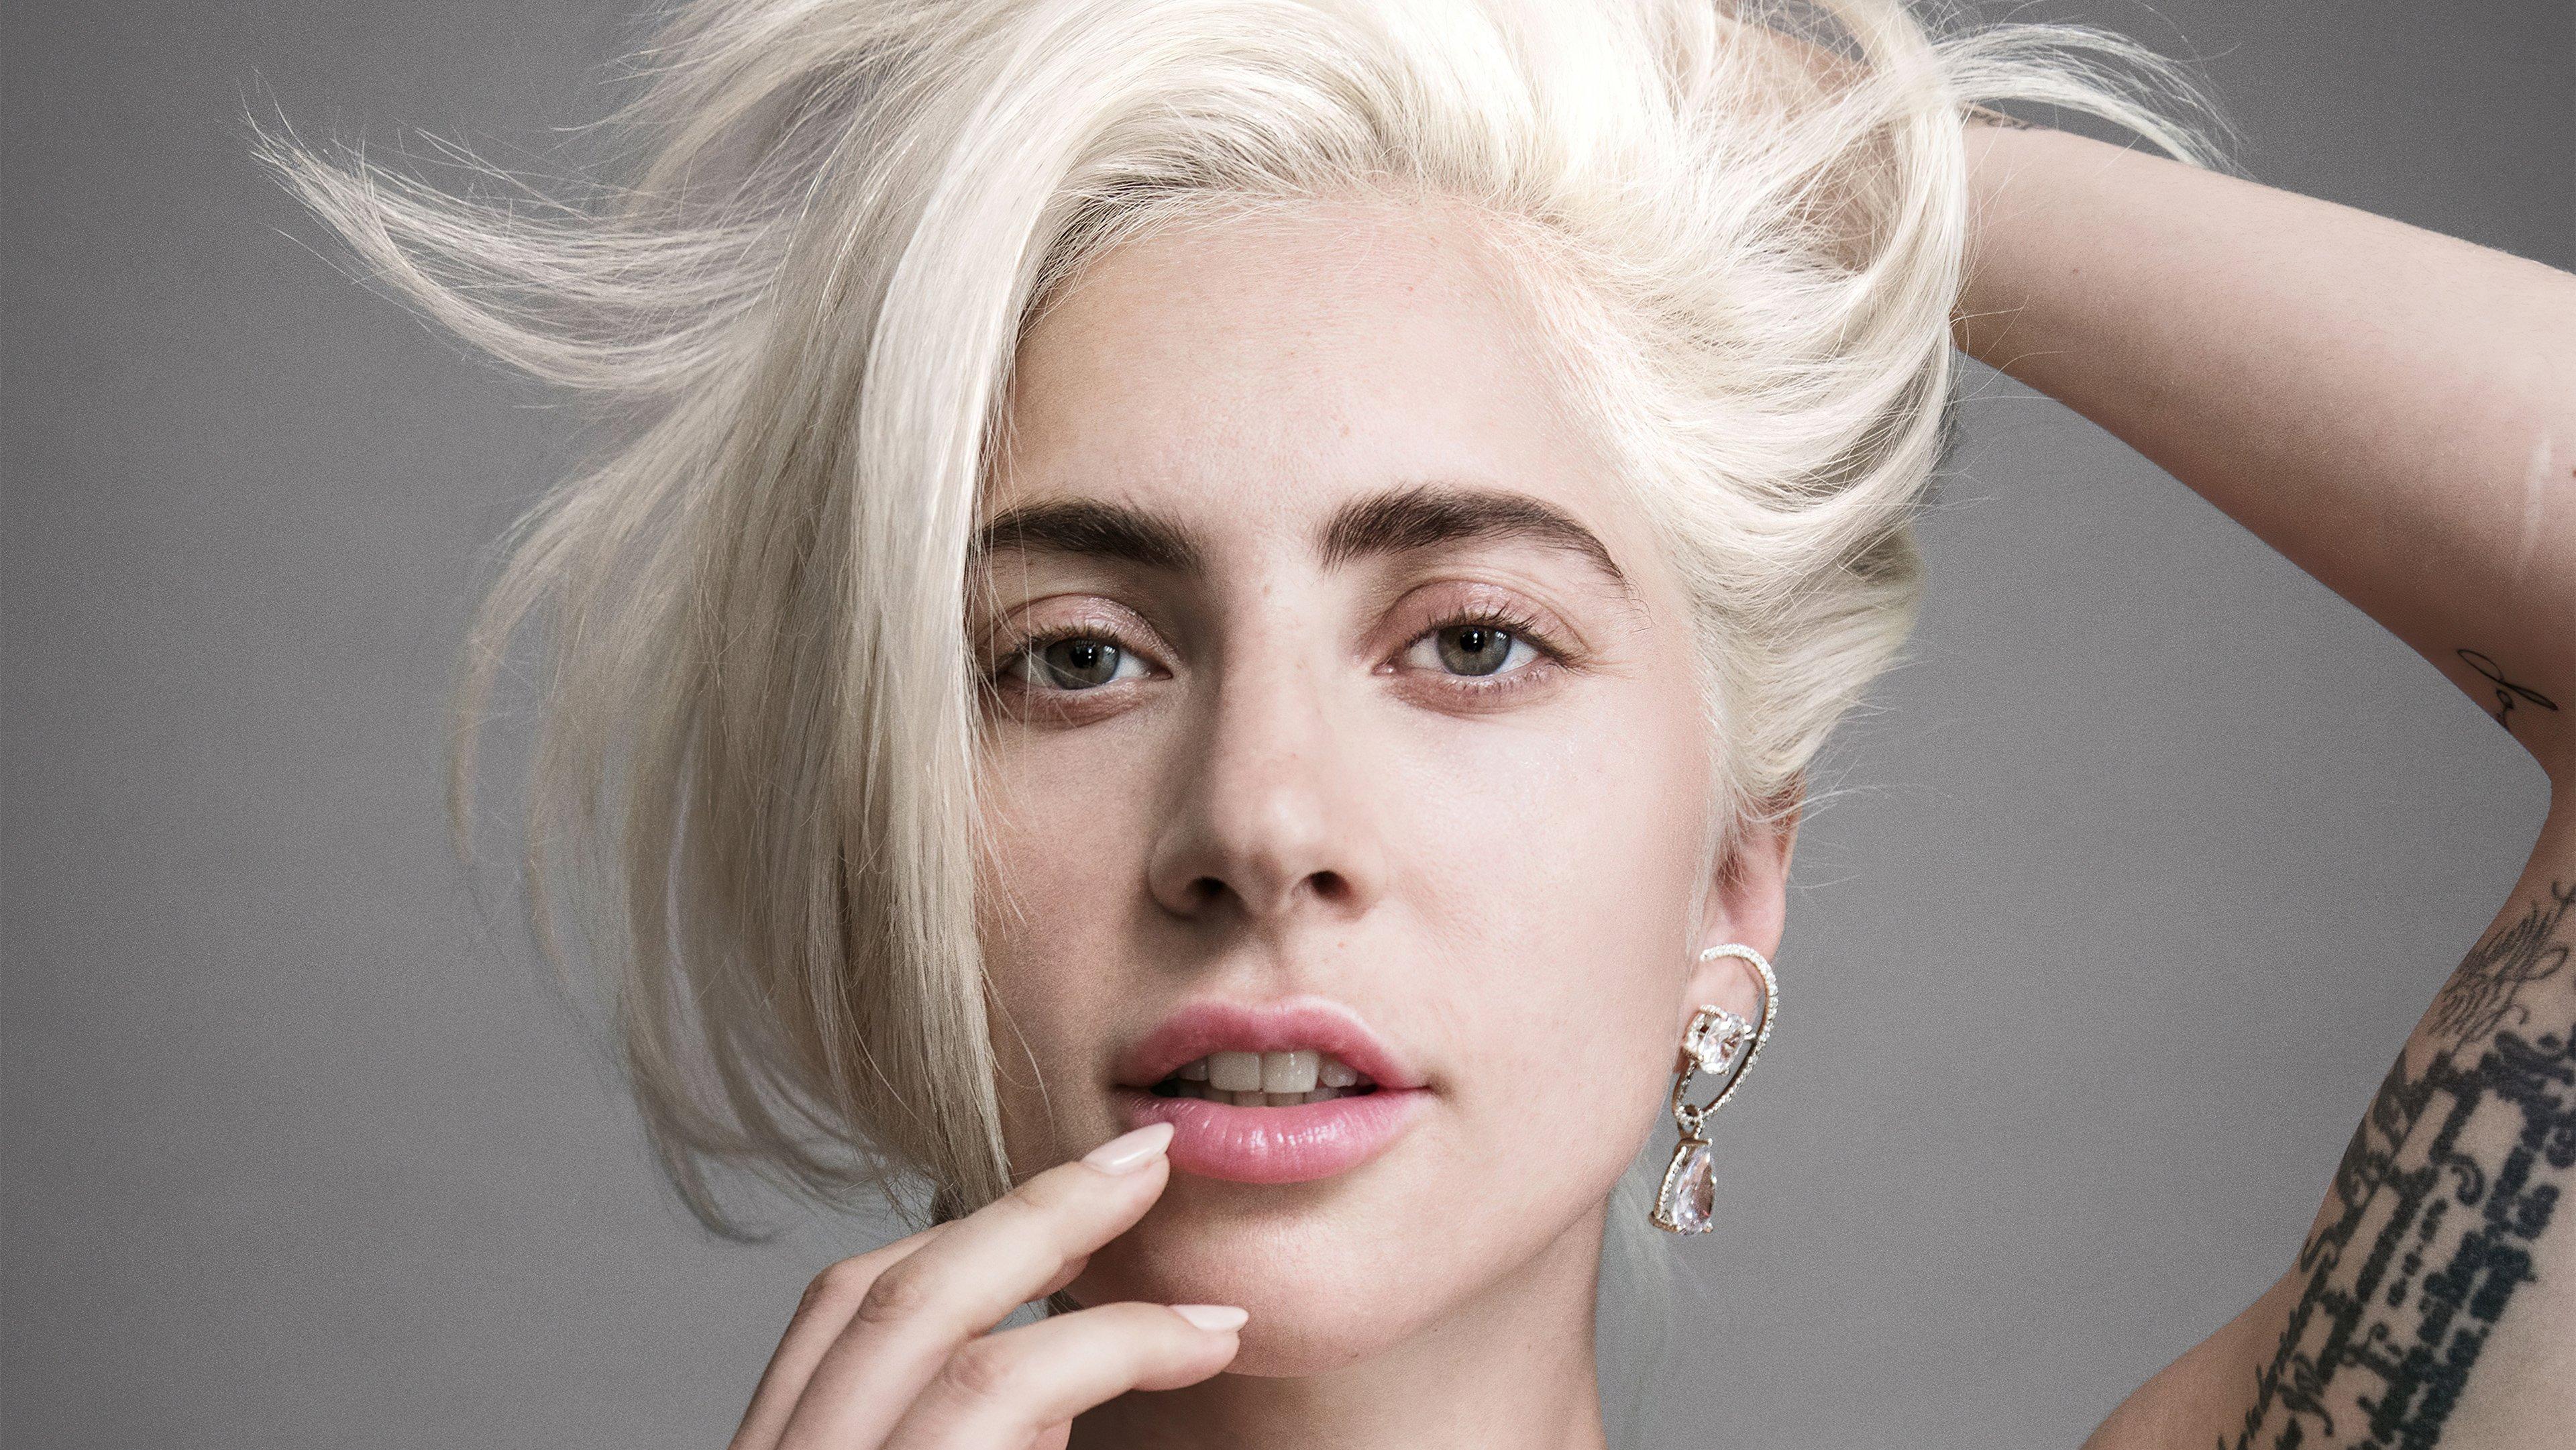 Wallpaper Lady Gaga without makeup 2021